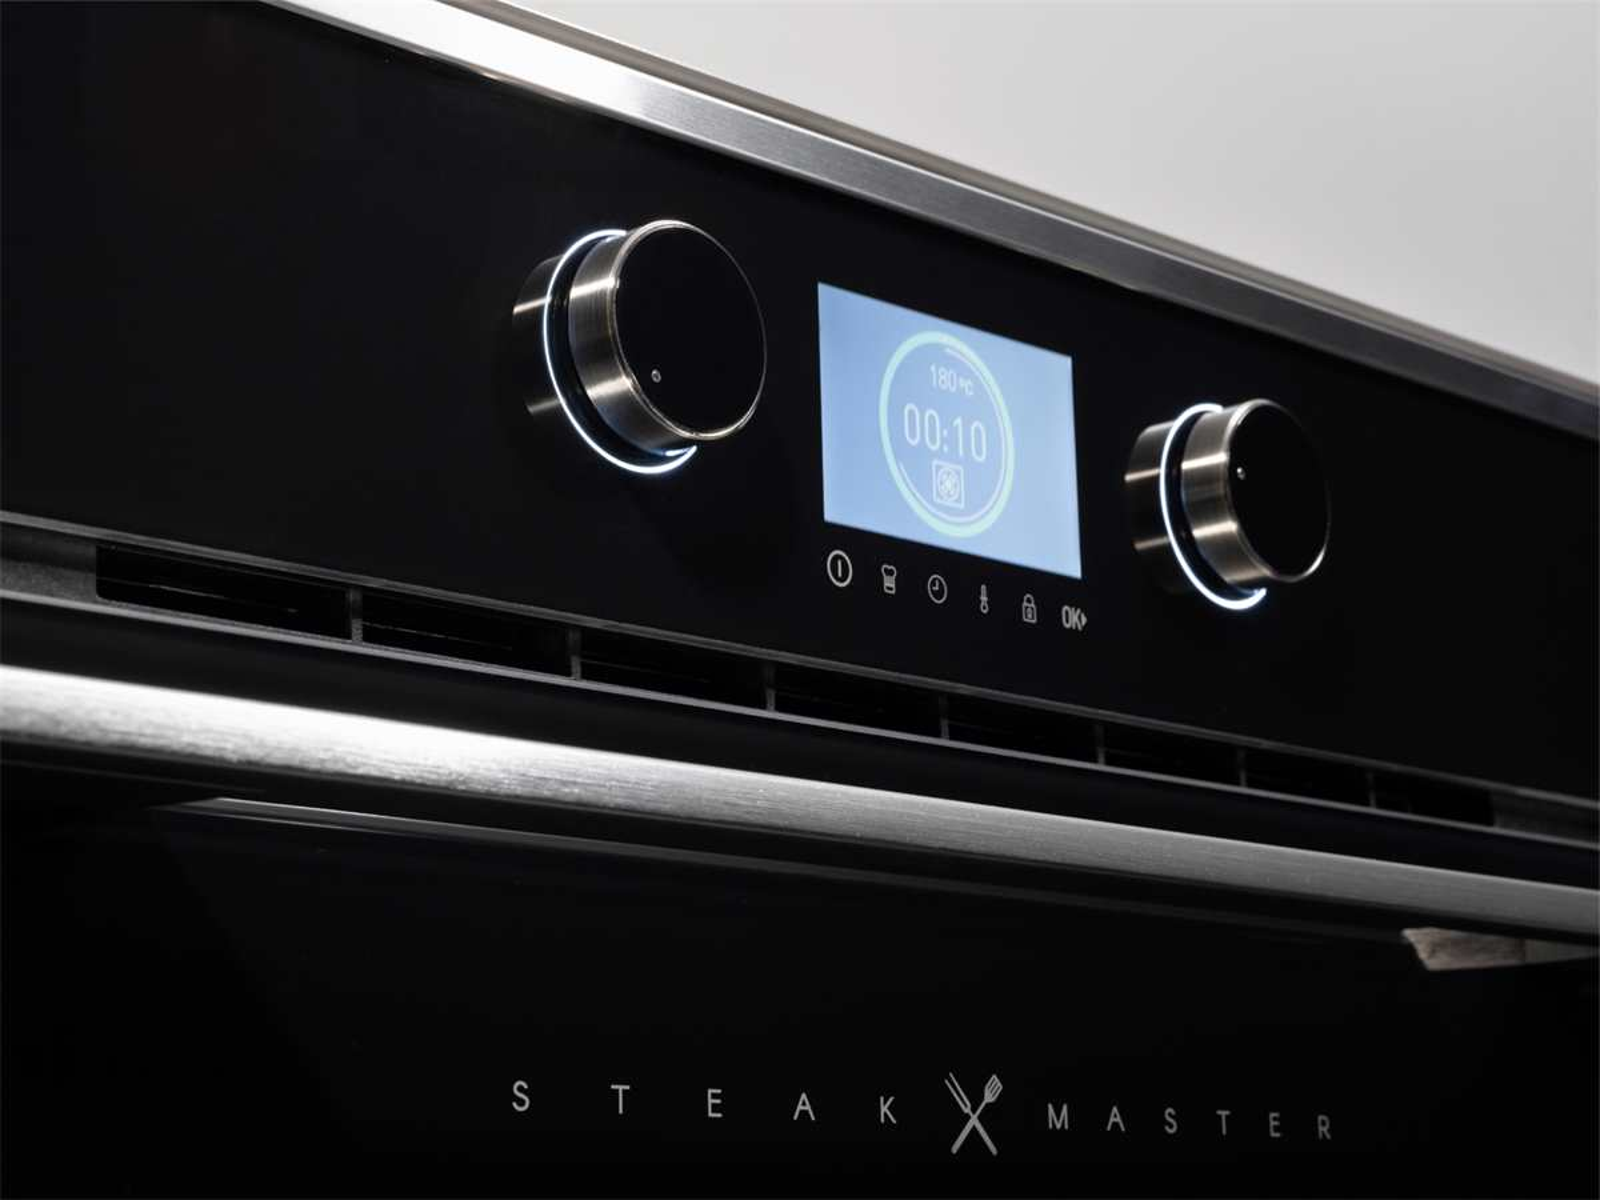 Teka SteakMaster Pyrolyse Backofen 700°C Power-Grill Schwarz